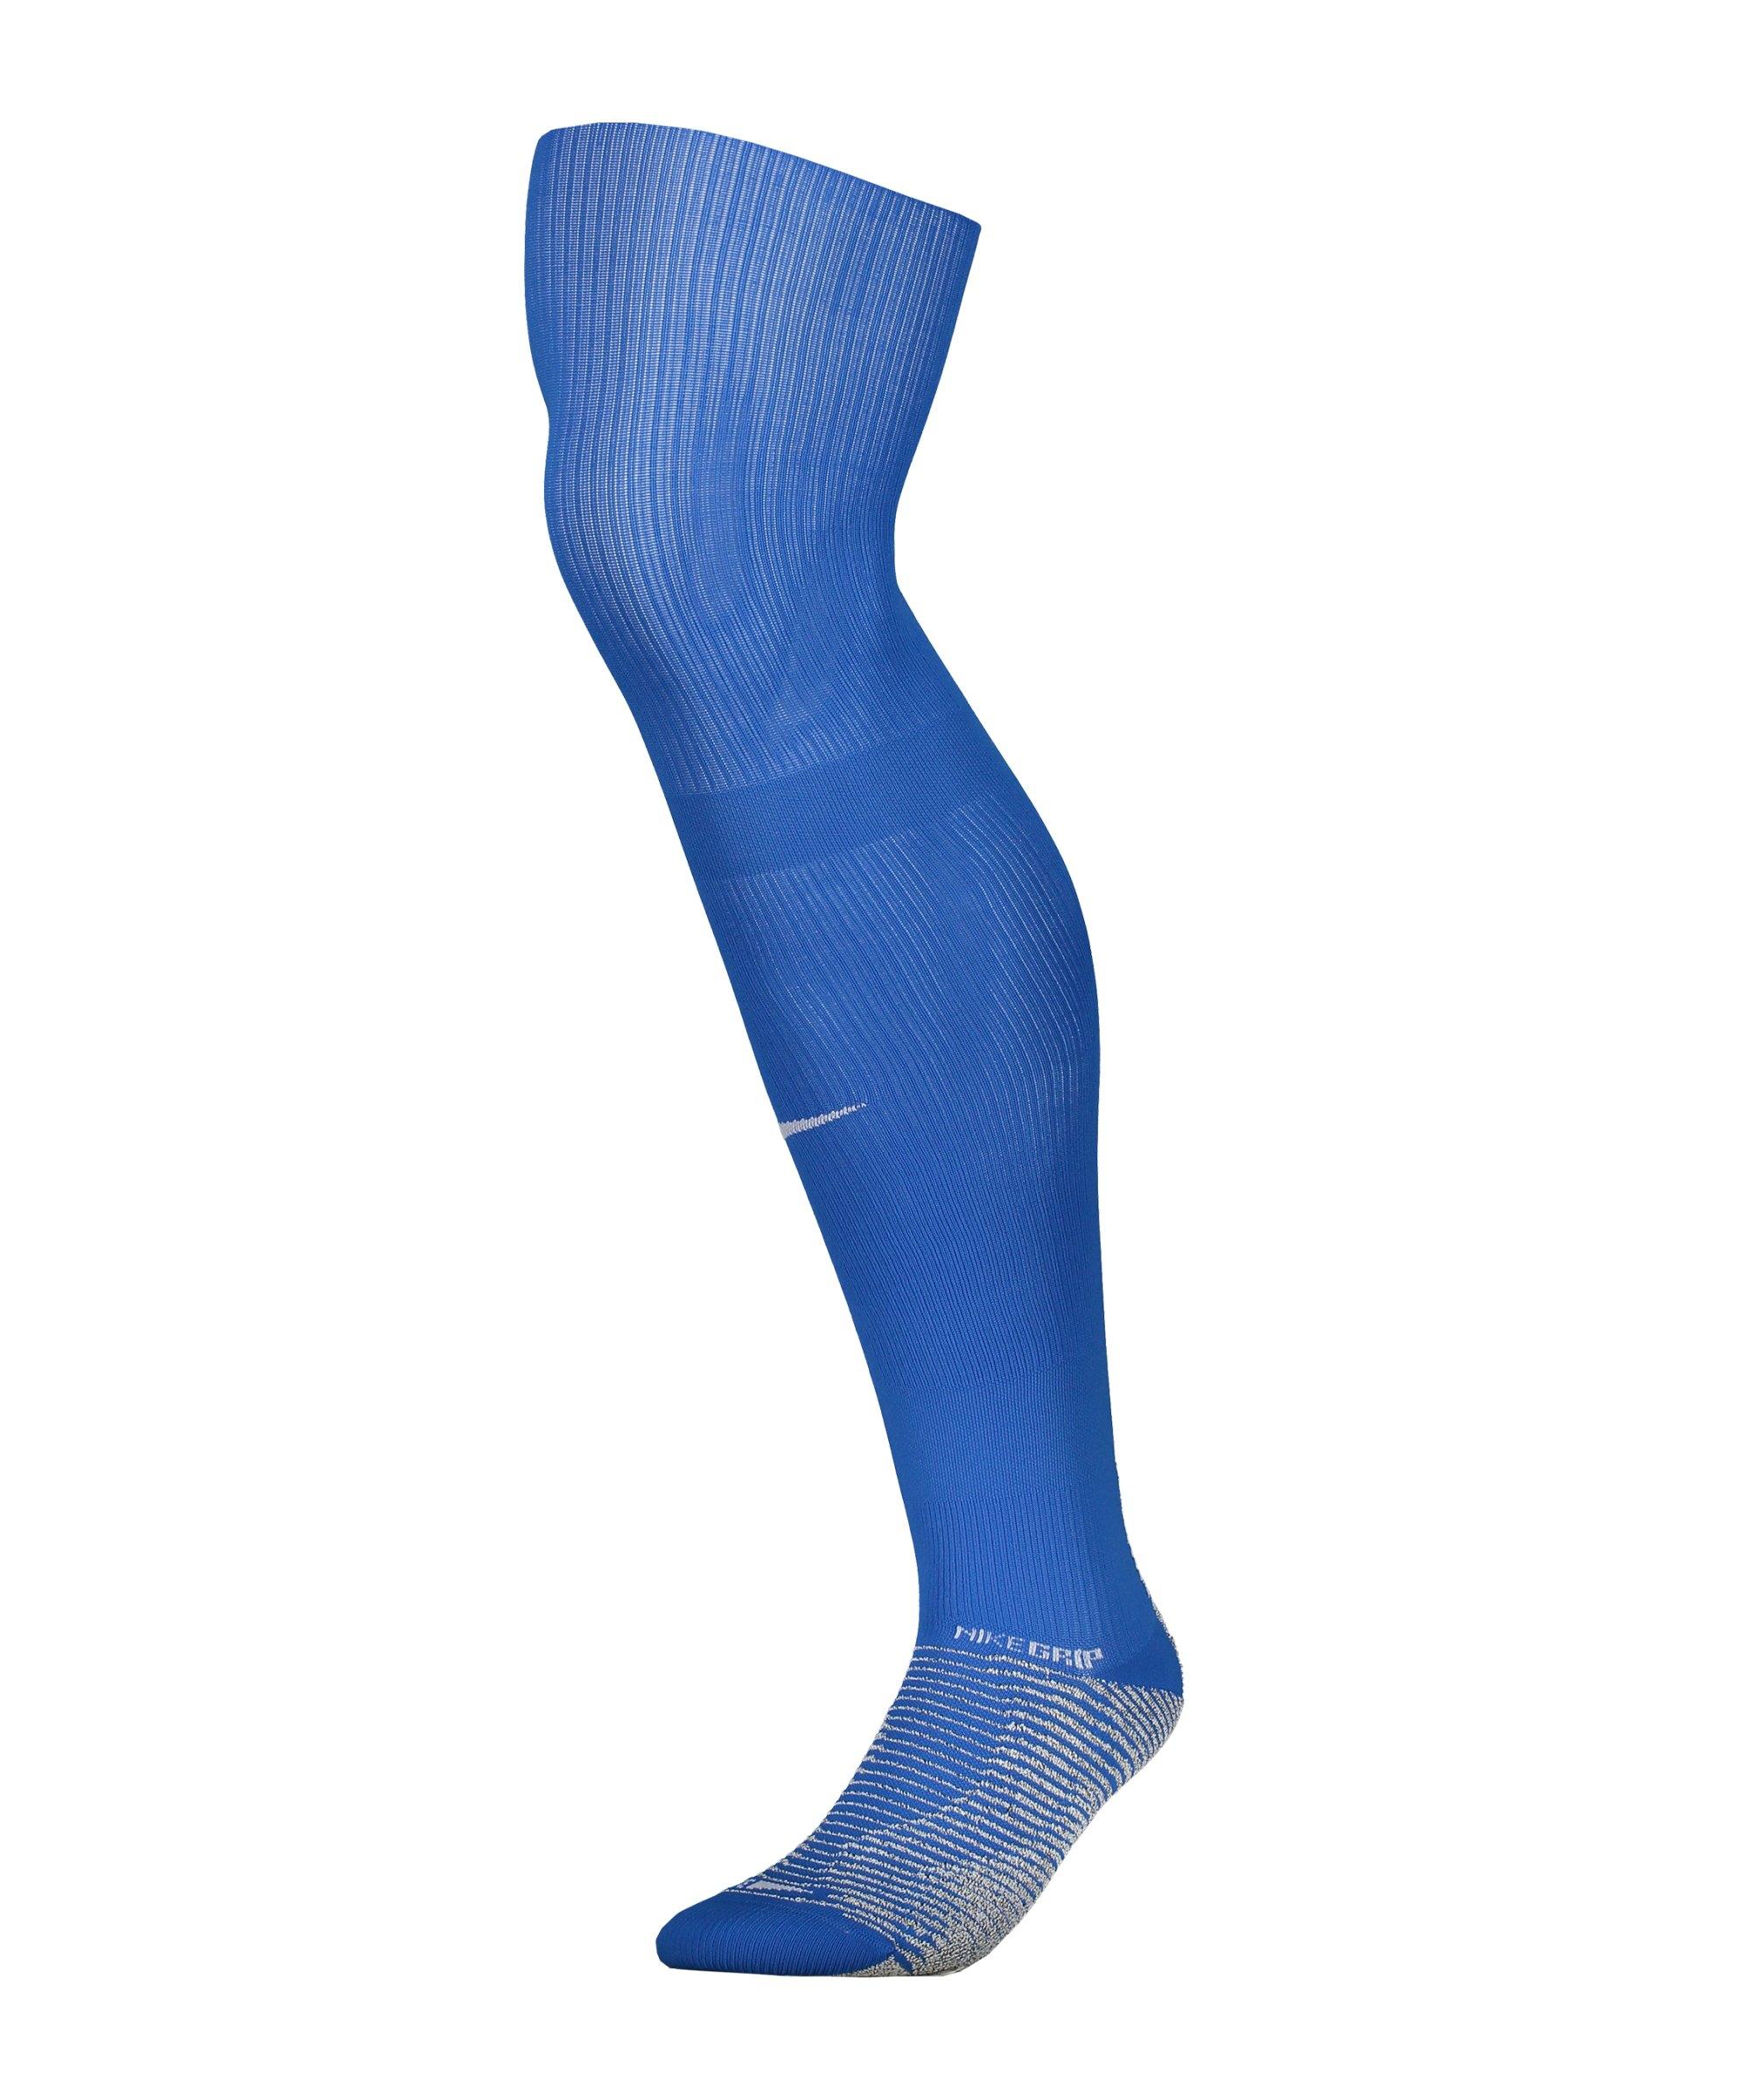 Nike Grip Strike Stutzenstrumpf Blau F463 - blau